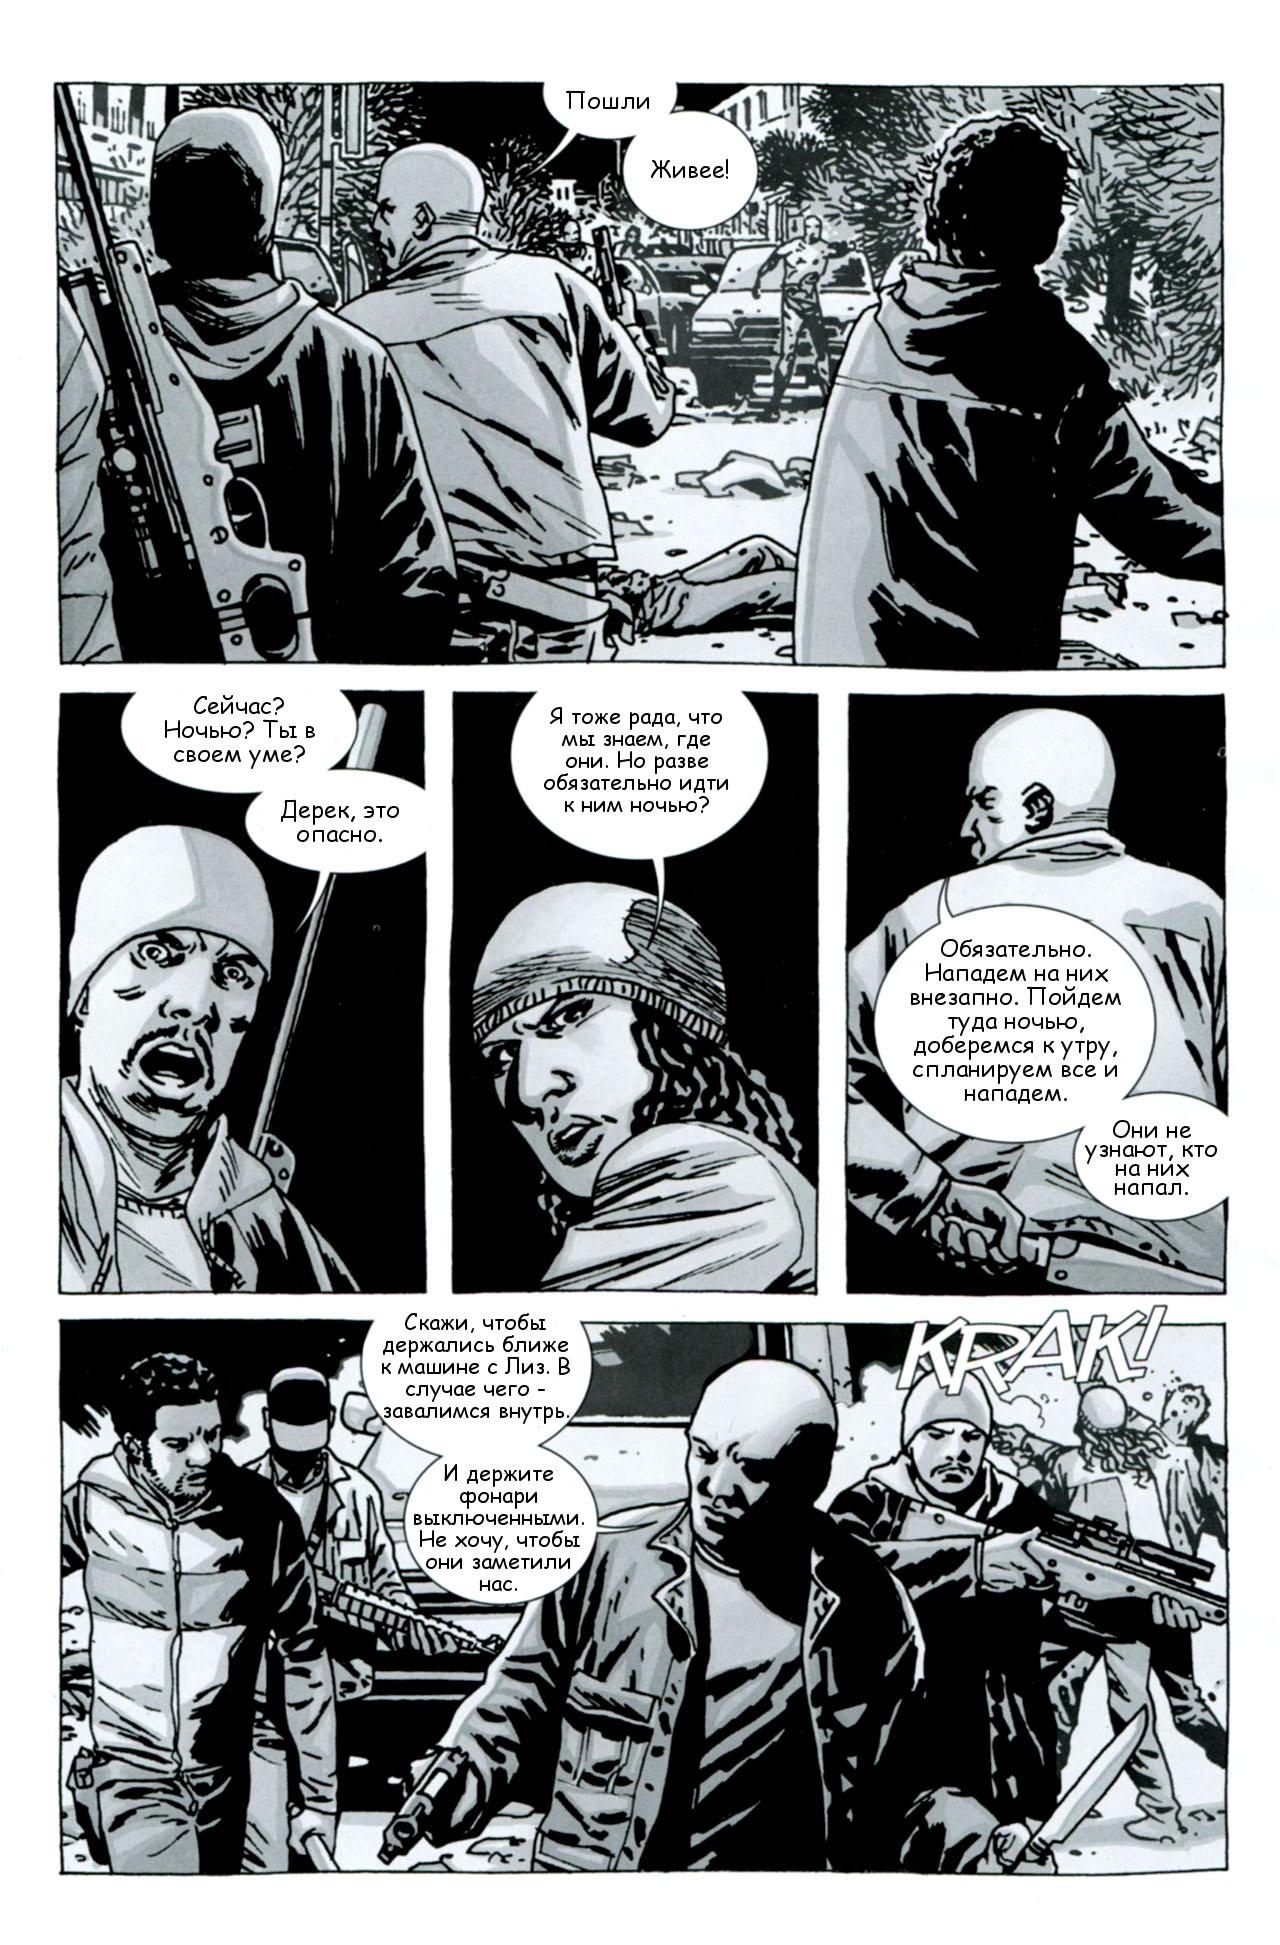 The walking dead комиксы 1-26 файлы патч, демо, demo, моды.